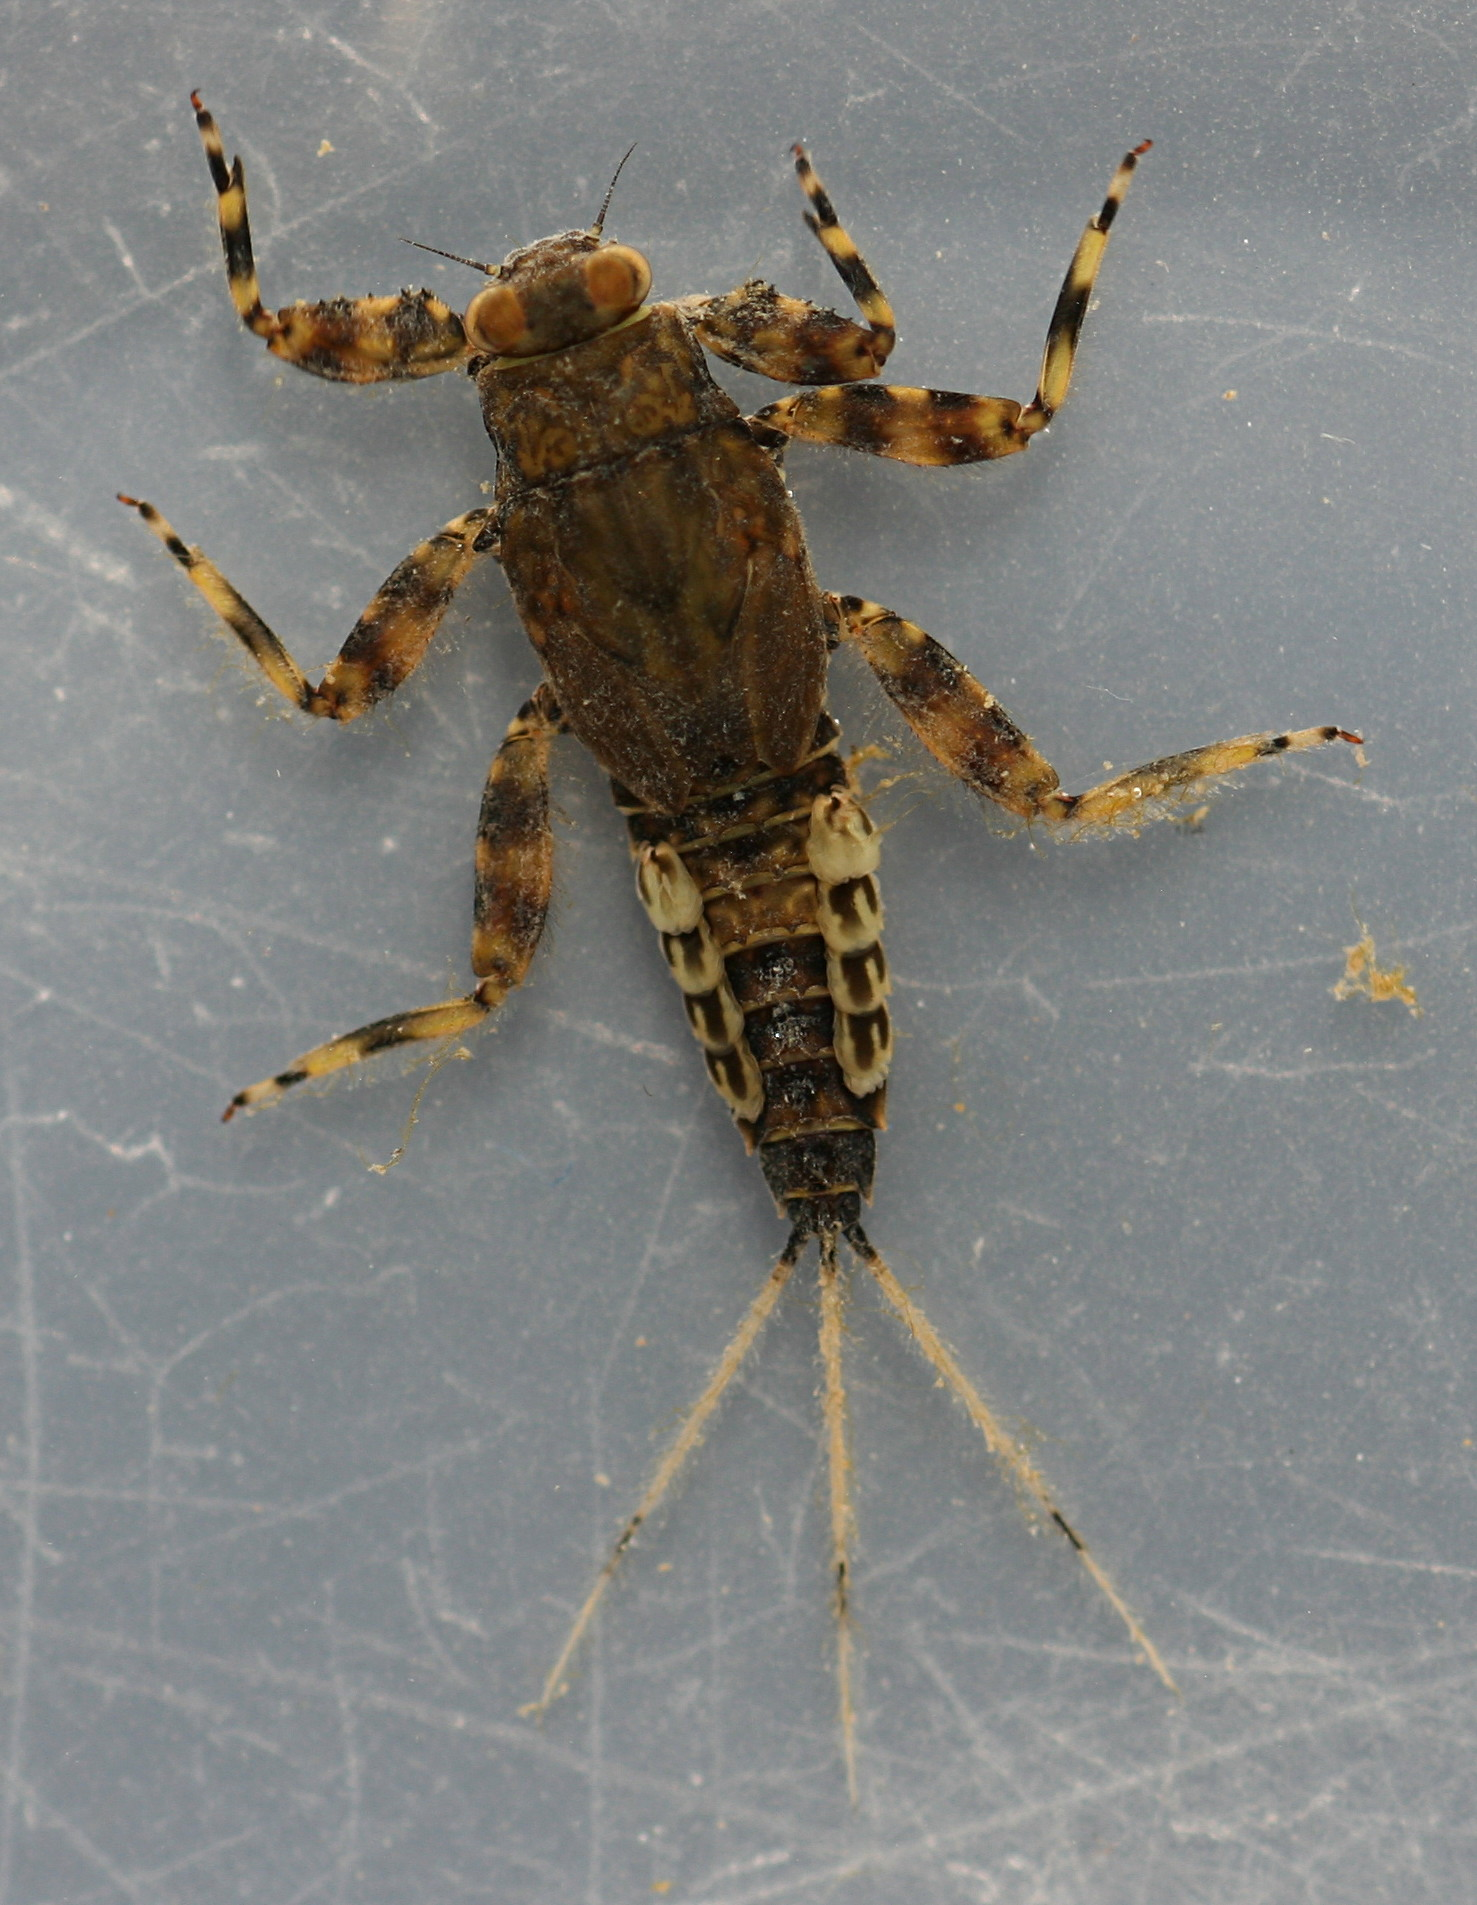 Live specimen, collected April 18, 2014.